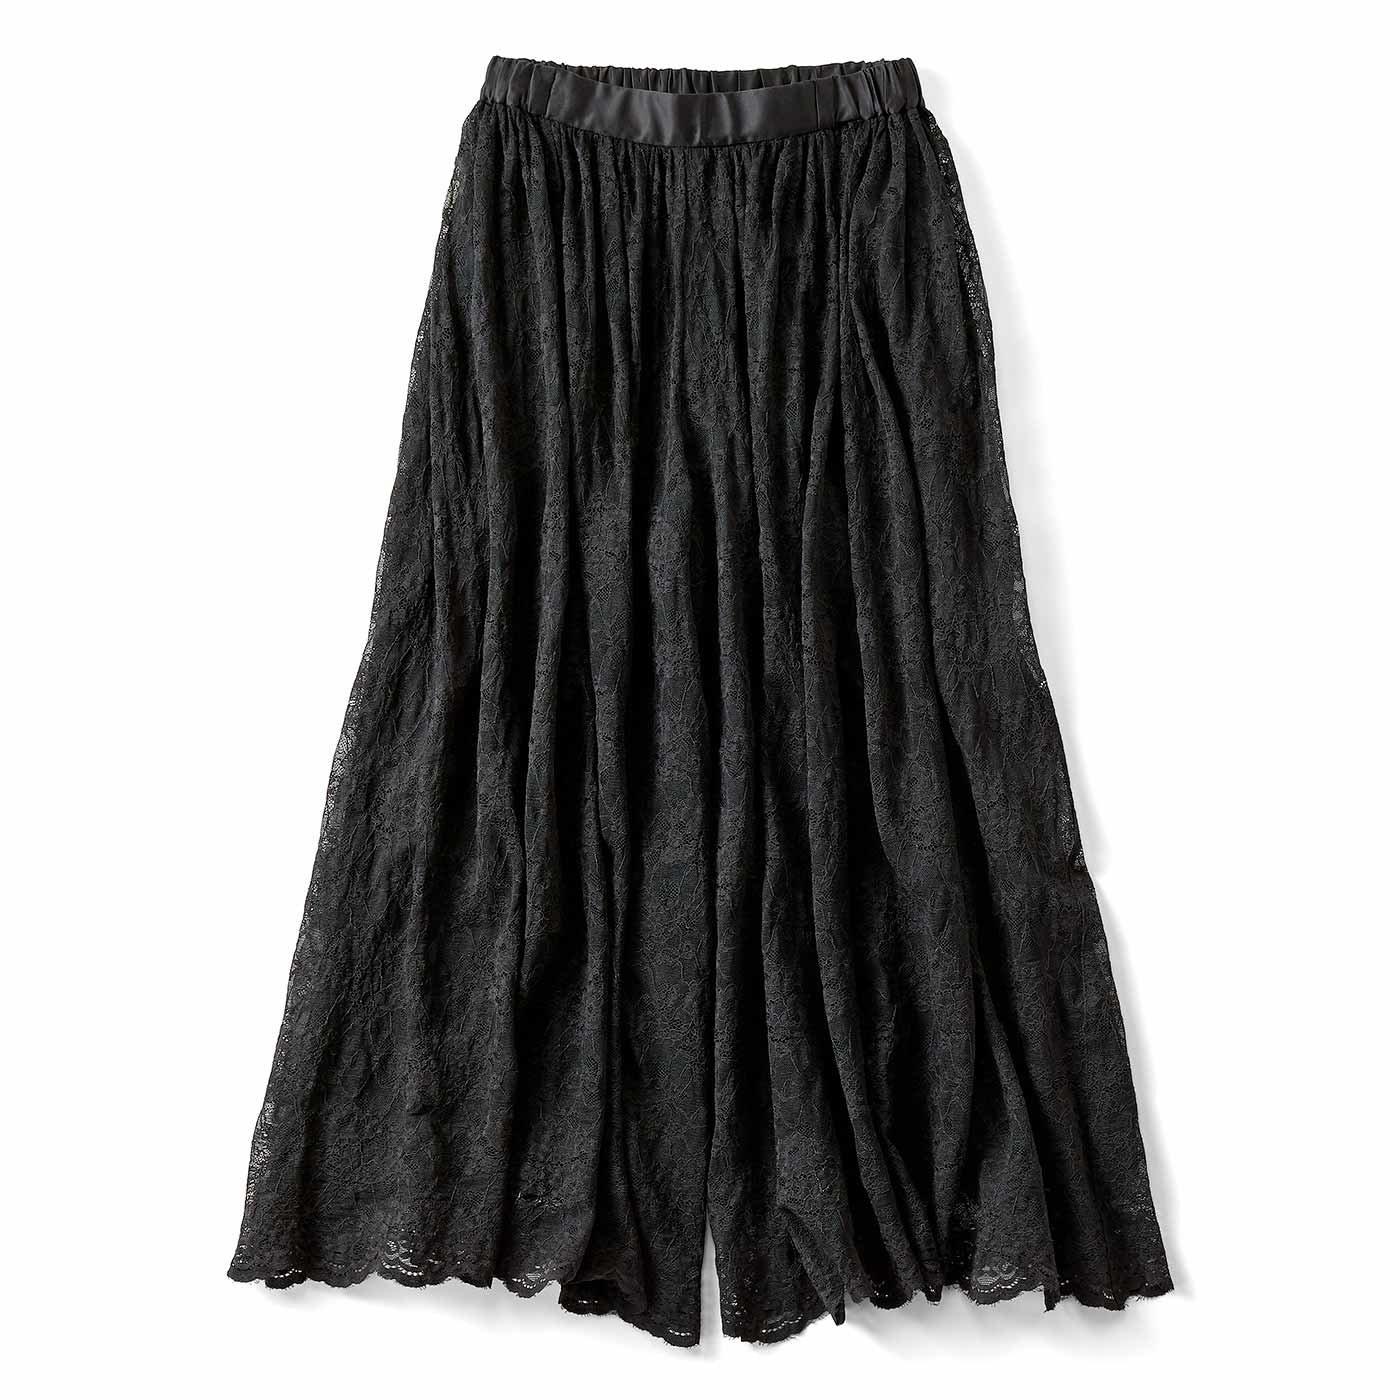 IEDIT[イディット] 吸汗速乾裏地付きのスカート見えシアーレースパンツ〈ブラック〉